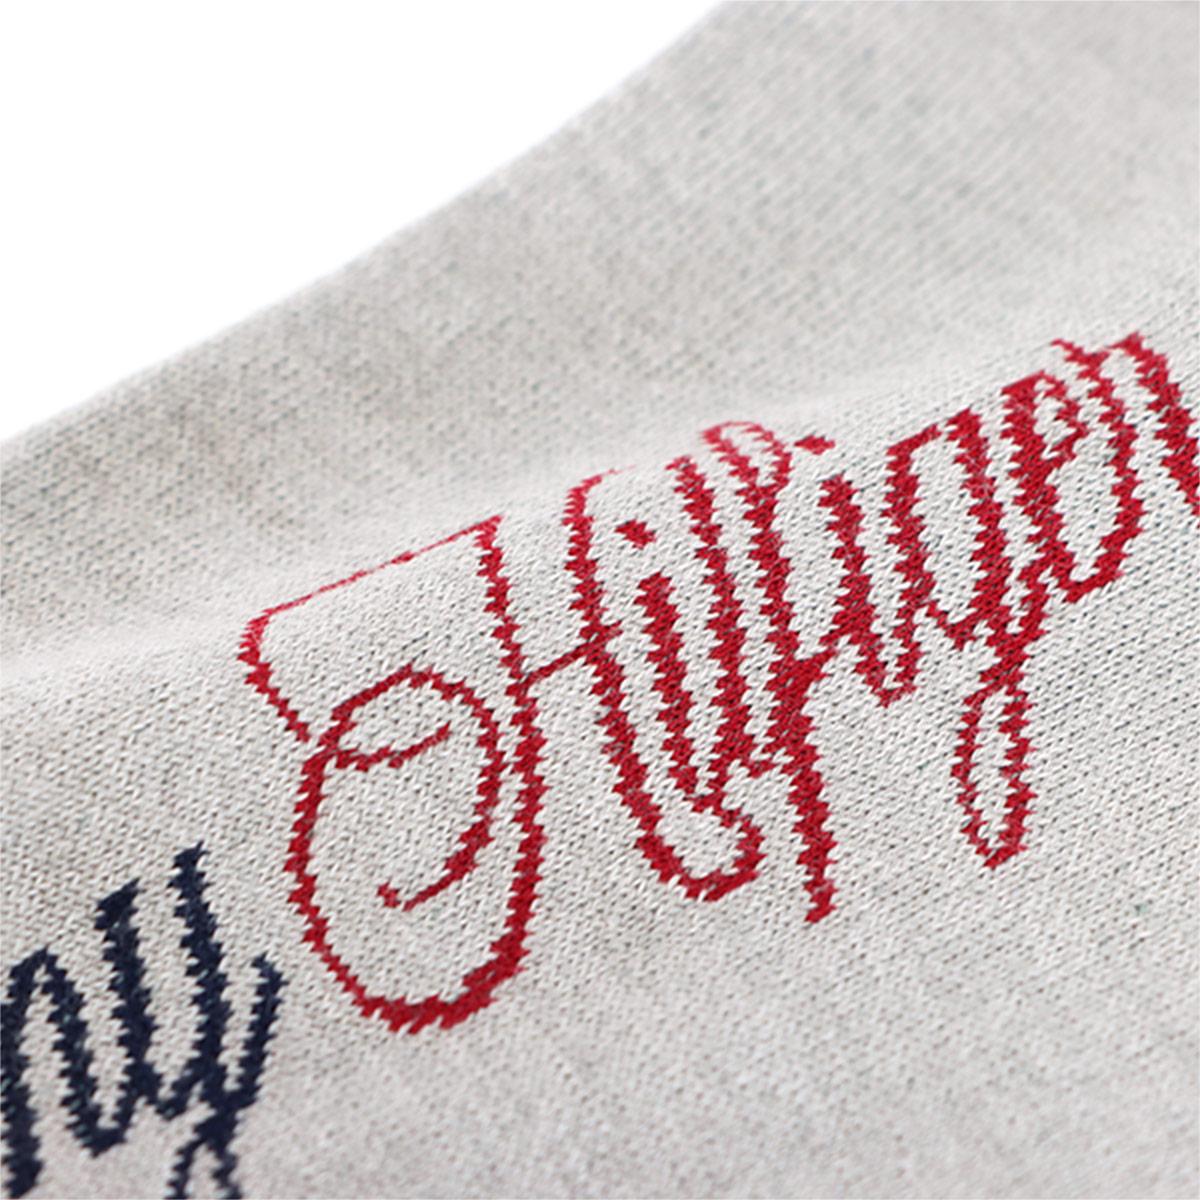 TOMMY HILFIGER トミーヒルフィガー カジュアル 足底メッシュ 縦ロゴ クルー丈 ソックス 靴下 男性 紳士 メンズ 02552576【ゆうパケット・4点まで】